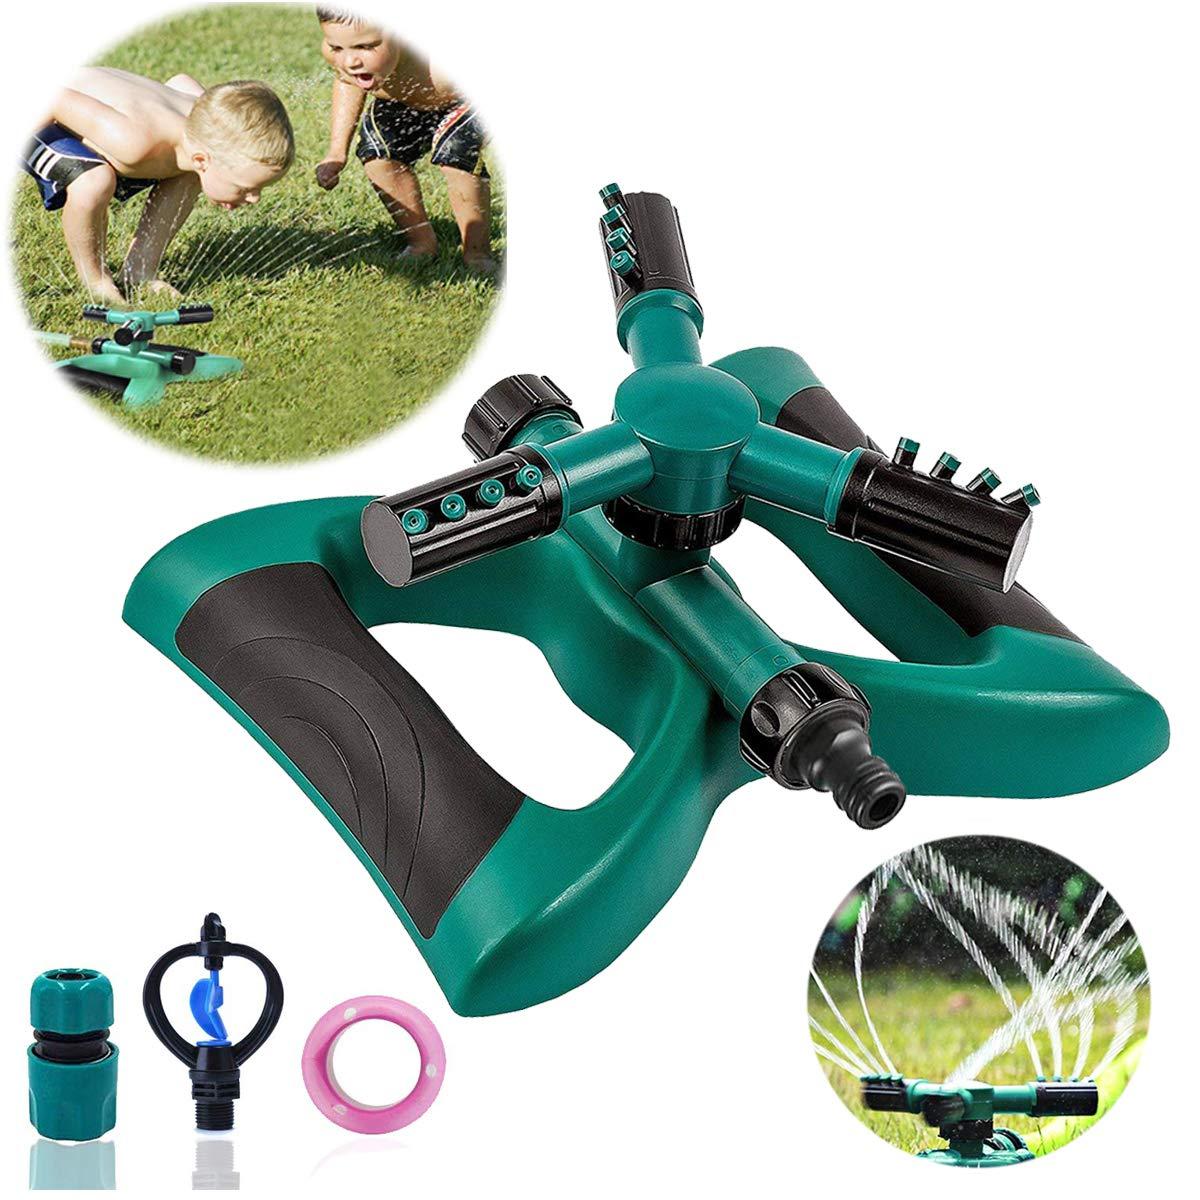 Lawn Sprinkler Automatic Sprinklers For Garden Water Sprinklers For Lawns